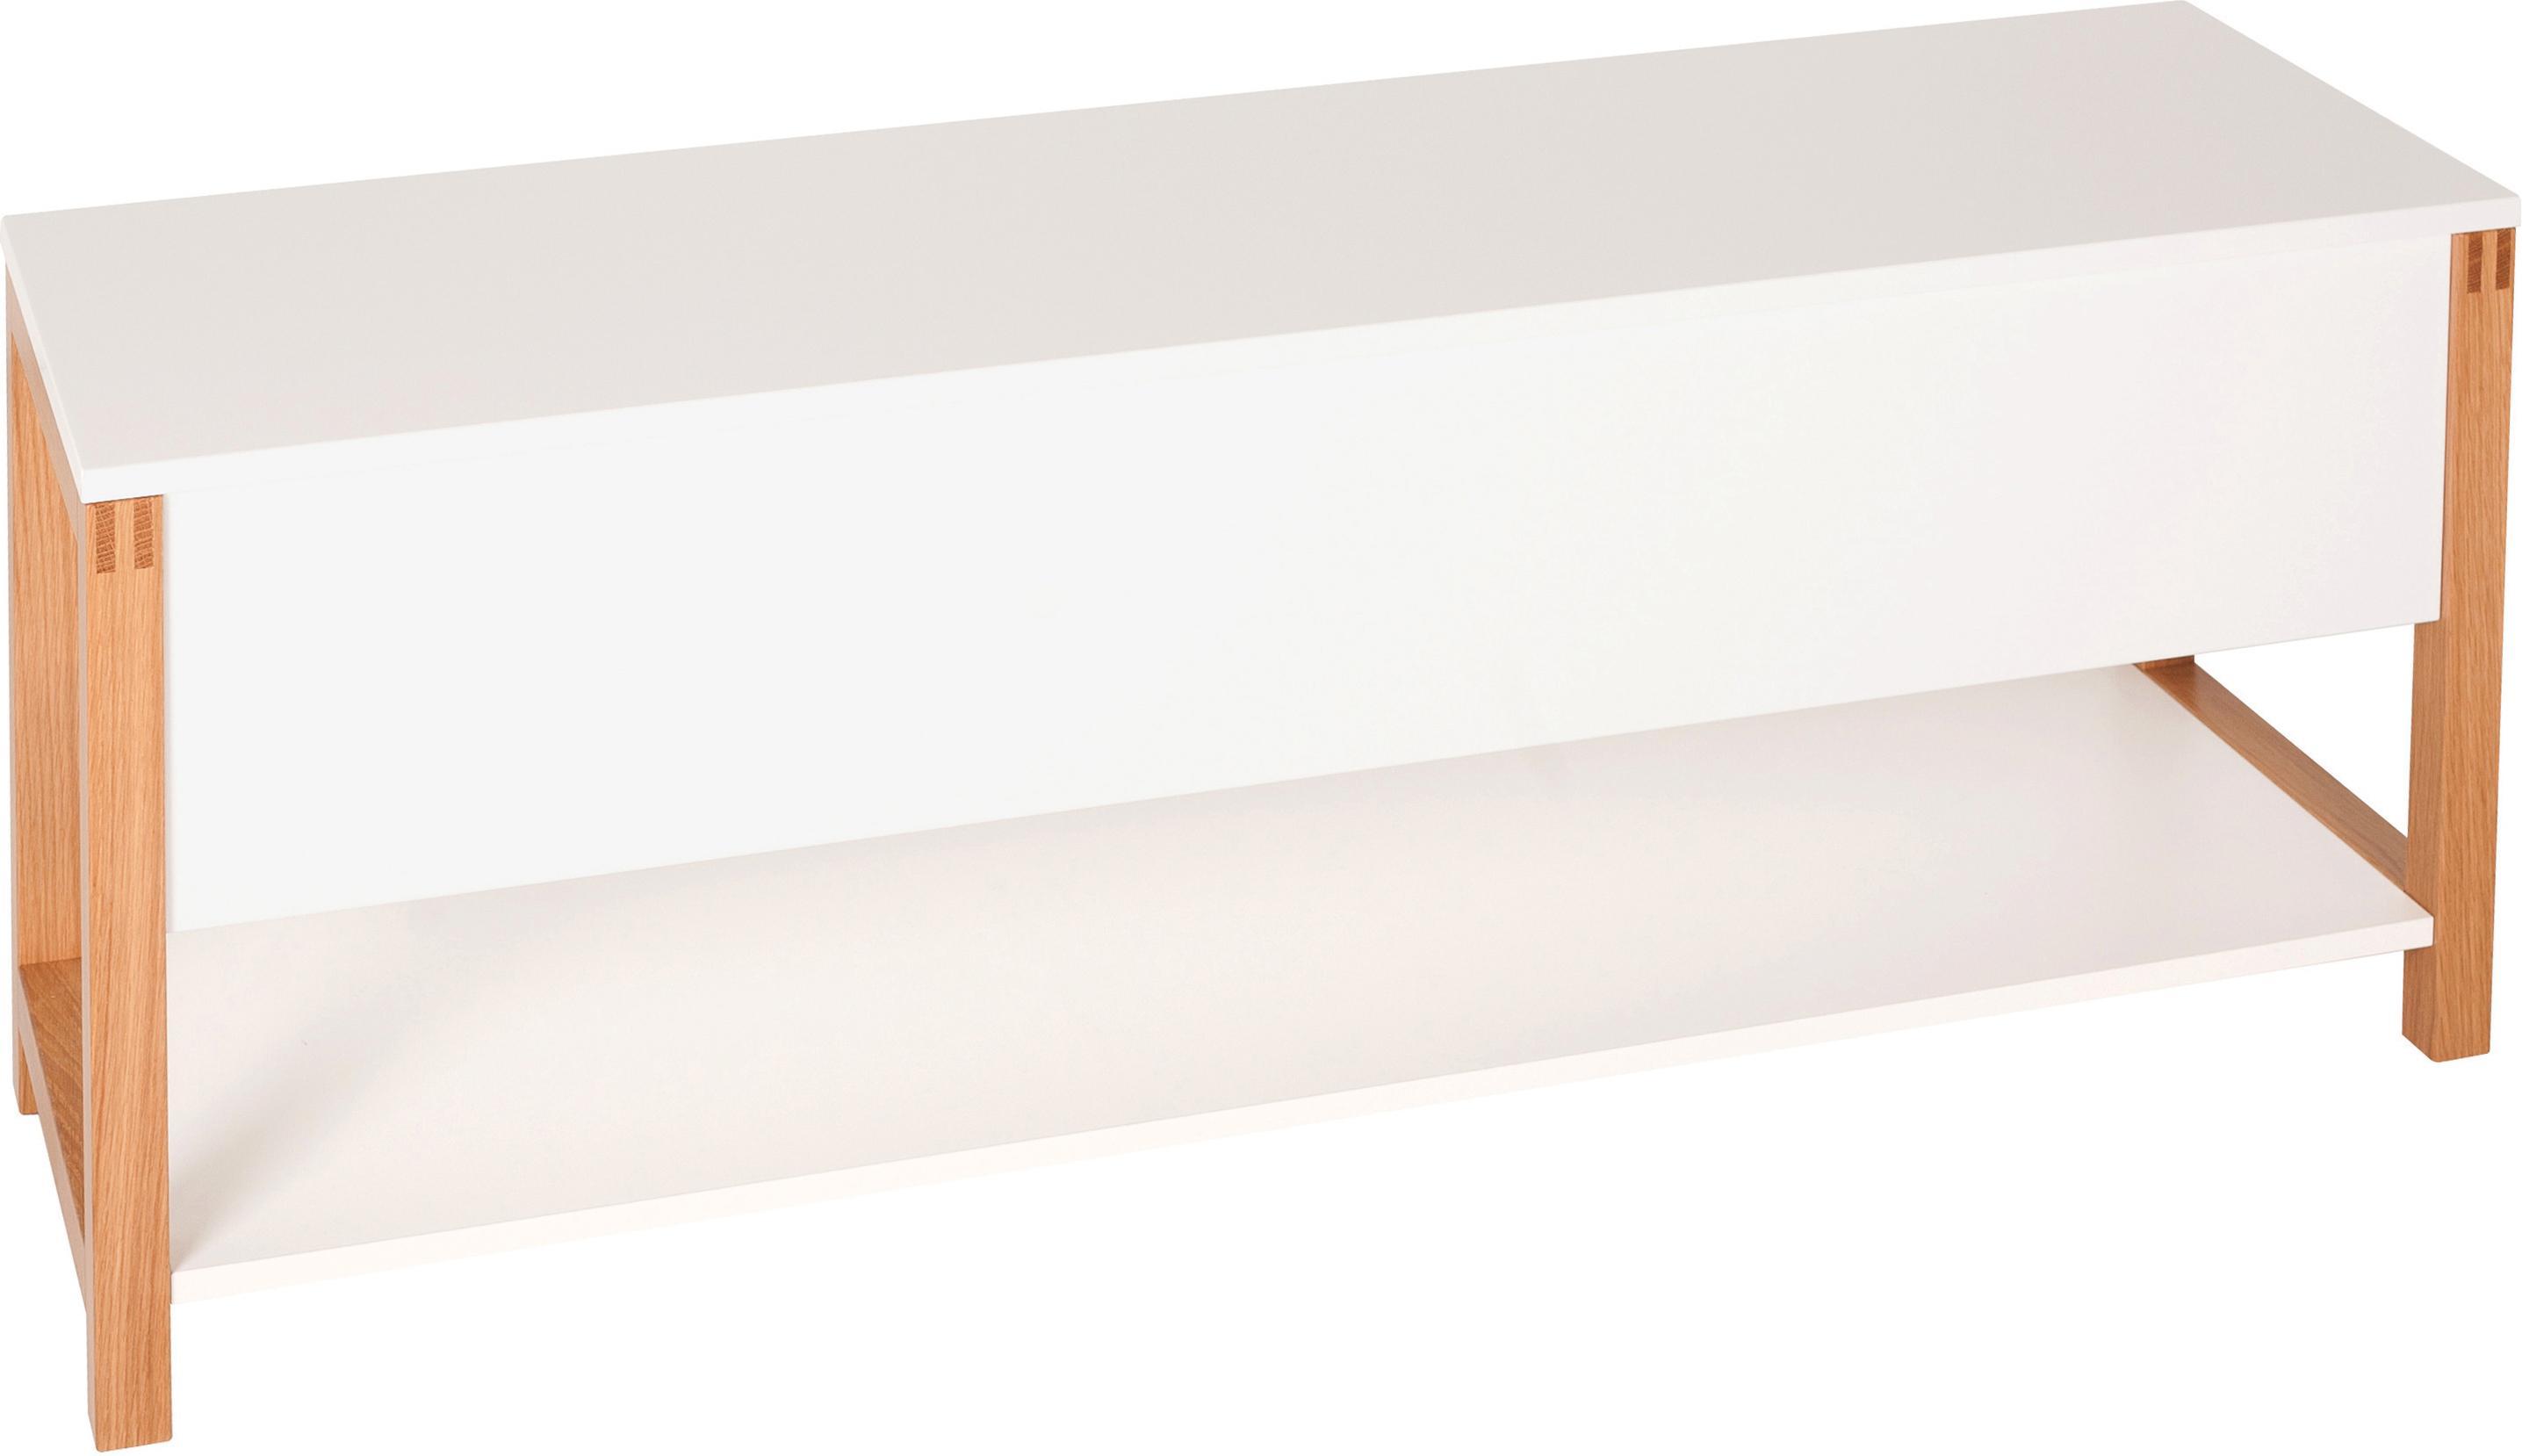 Bankje Northgate Flip, Frame: eikenhout, Wit, 120 x 48 cm